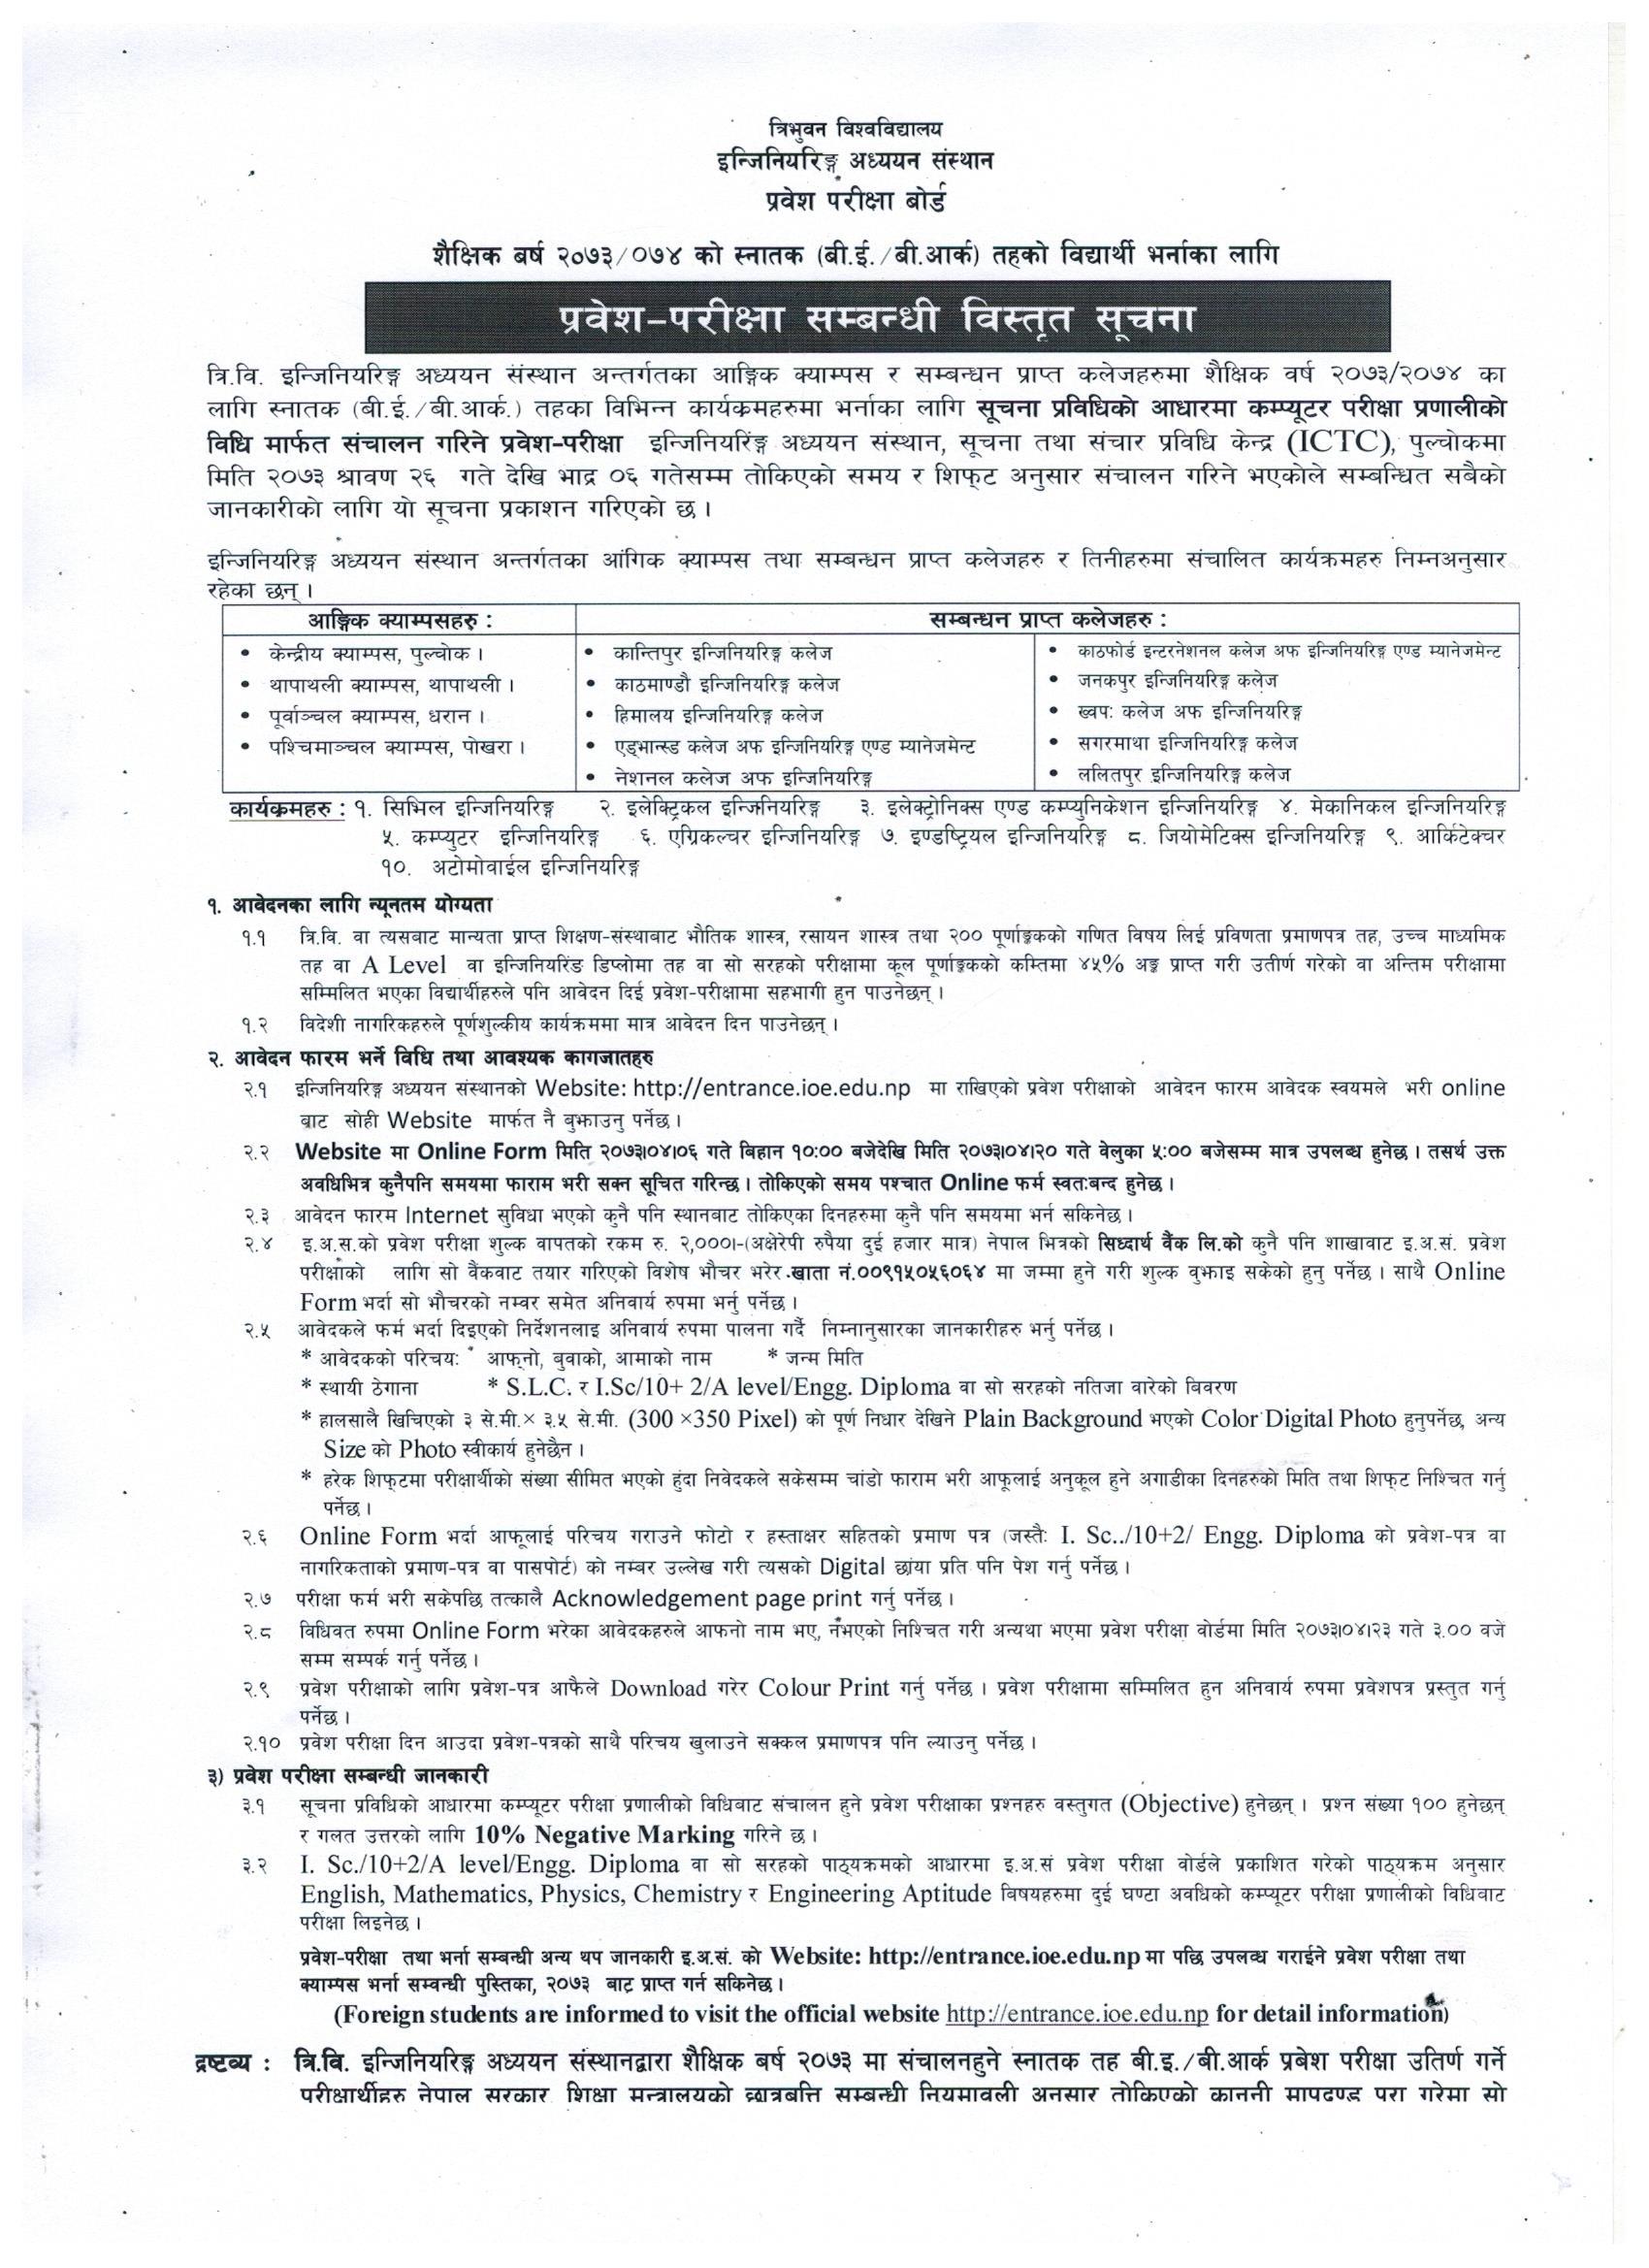 Detail Notice of IOE for IOE Entrance Examination 2073